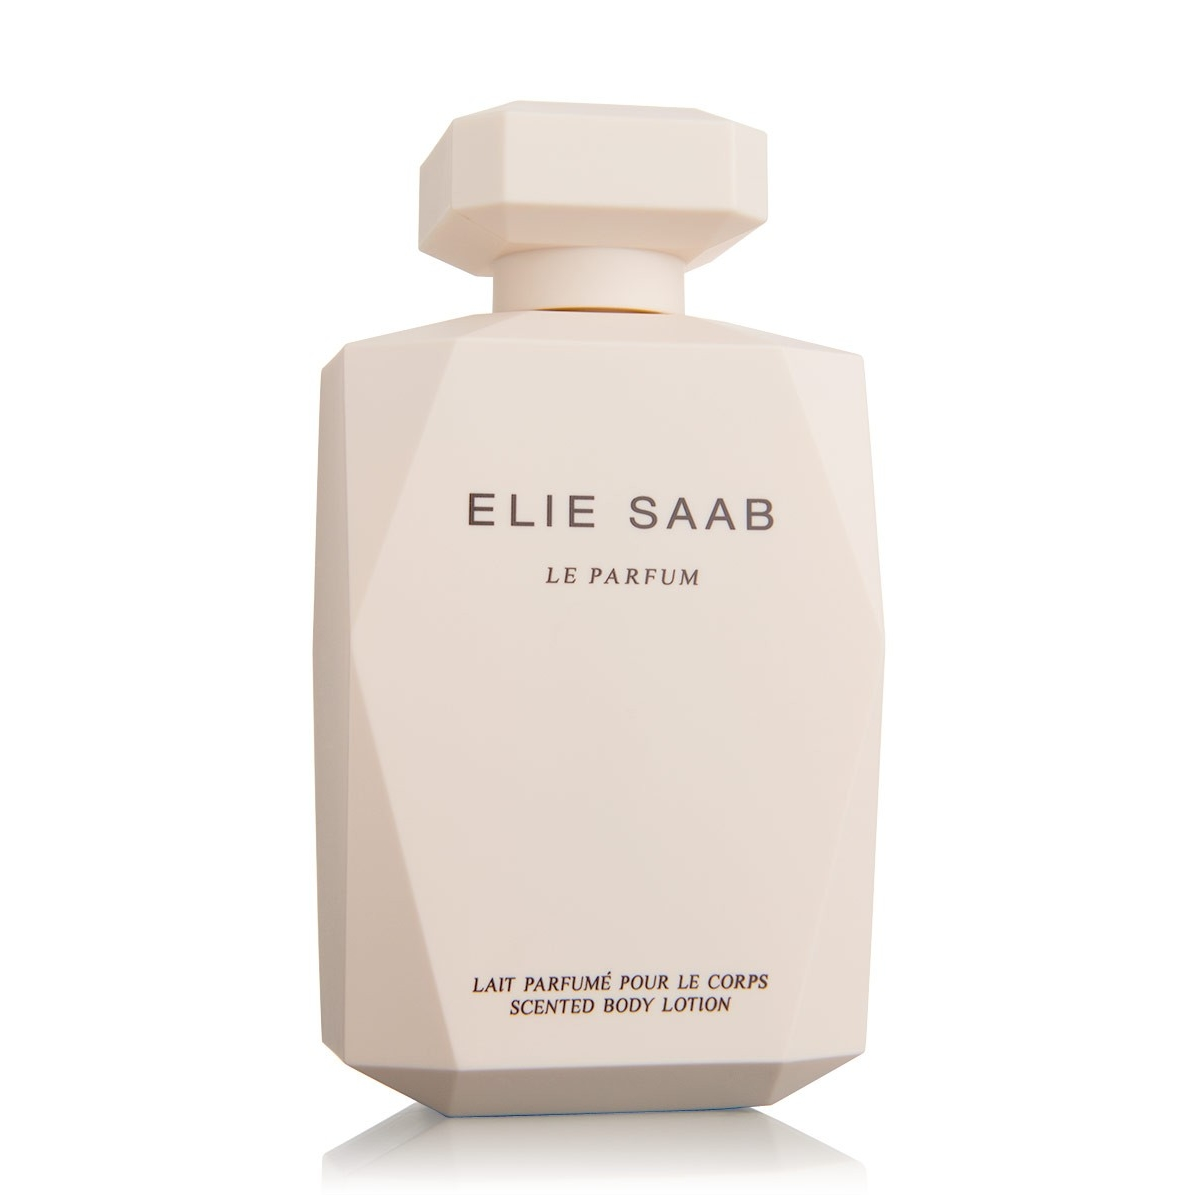 Elie Saab Le Parfum latte profumato per il corpo 200 ml